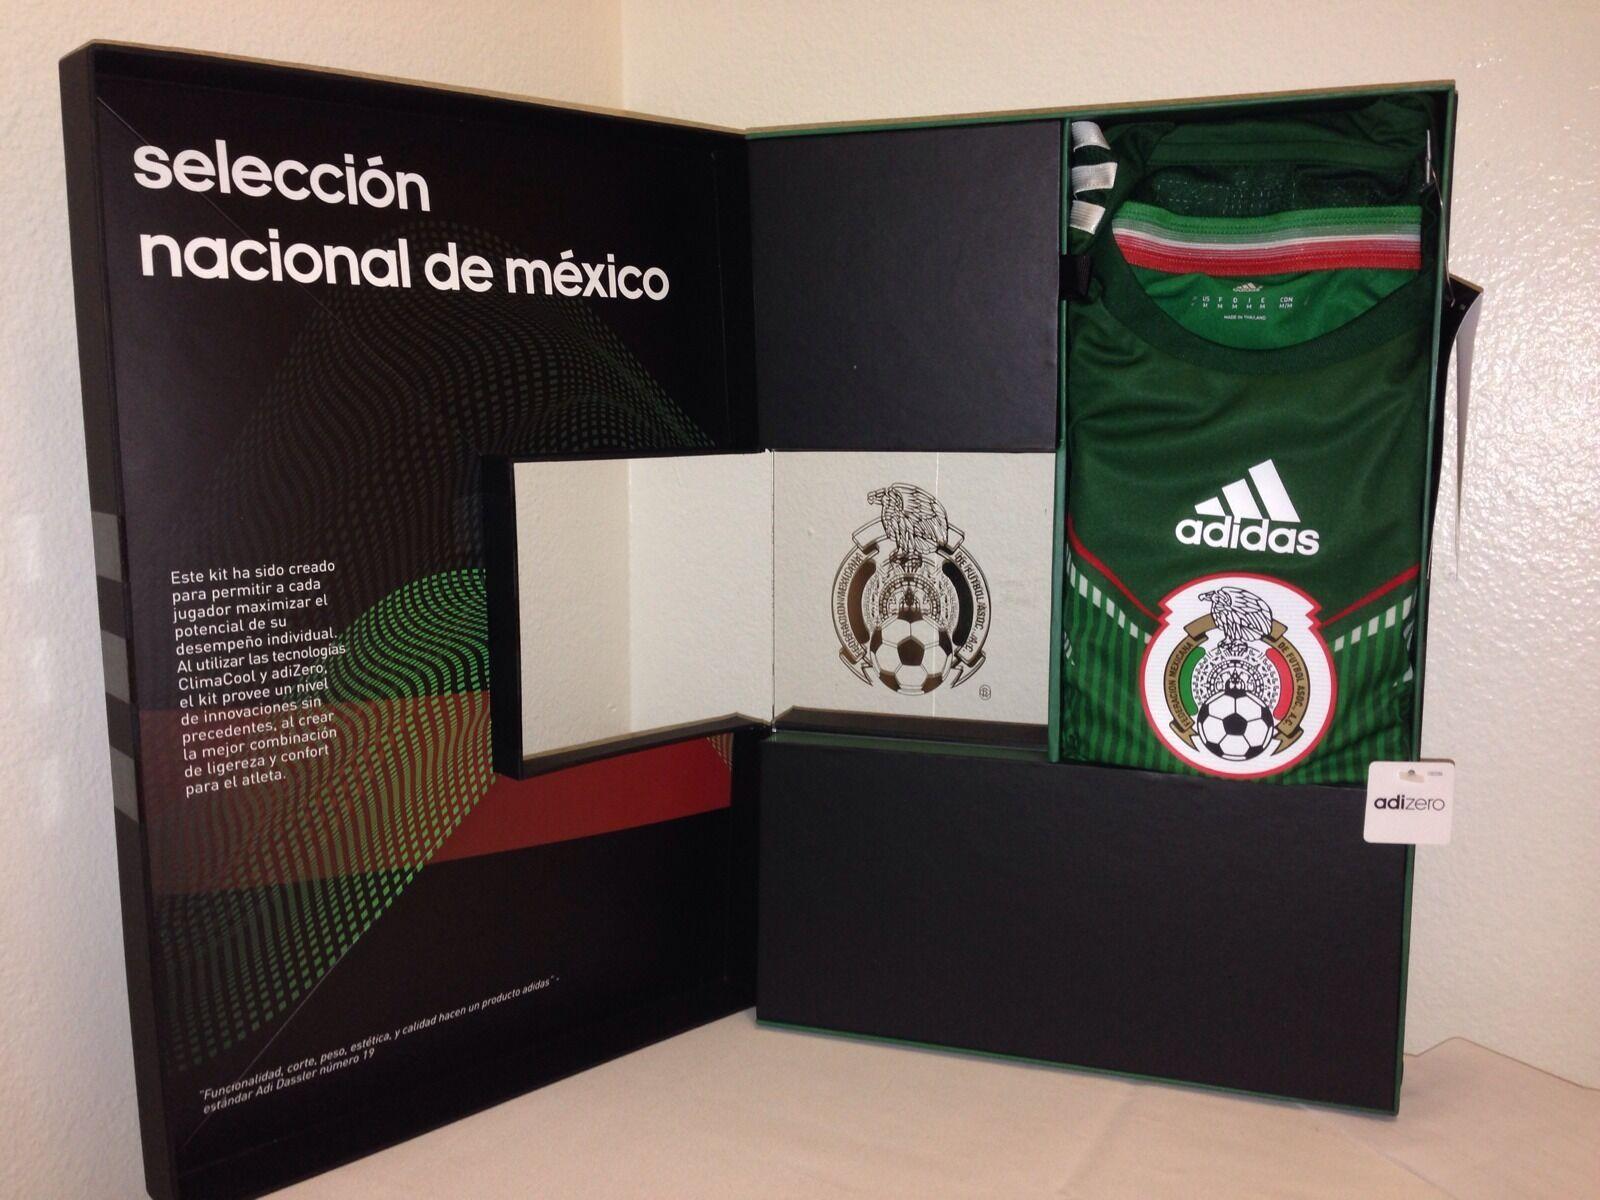 Adidas Mexico adizero limited edition World Cup Kit Shirt Shorts